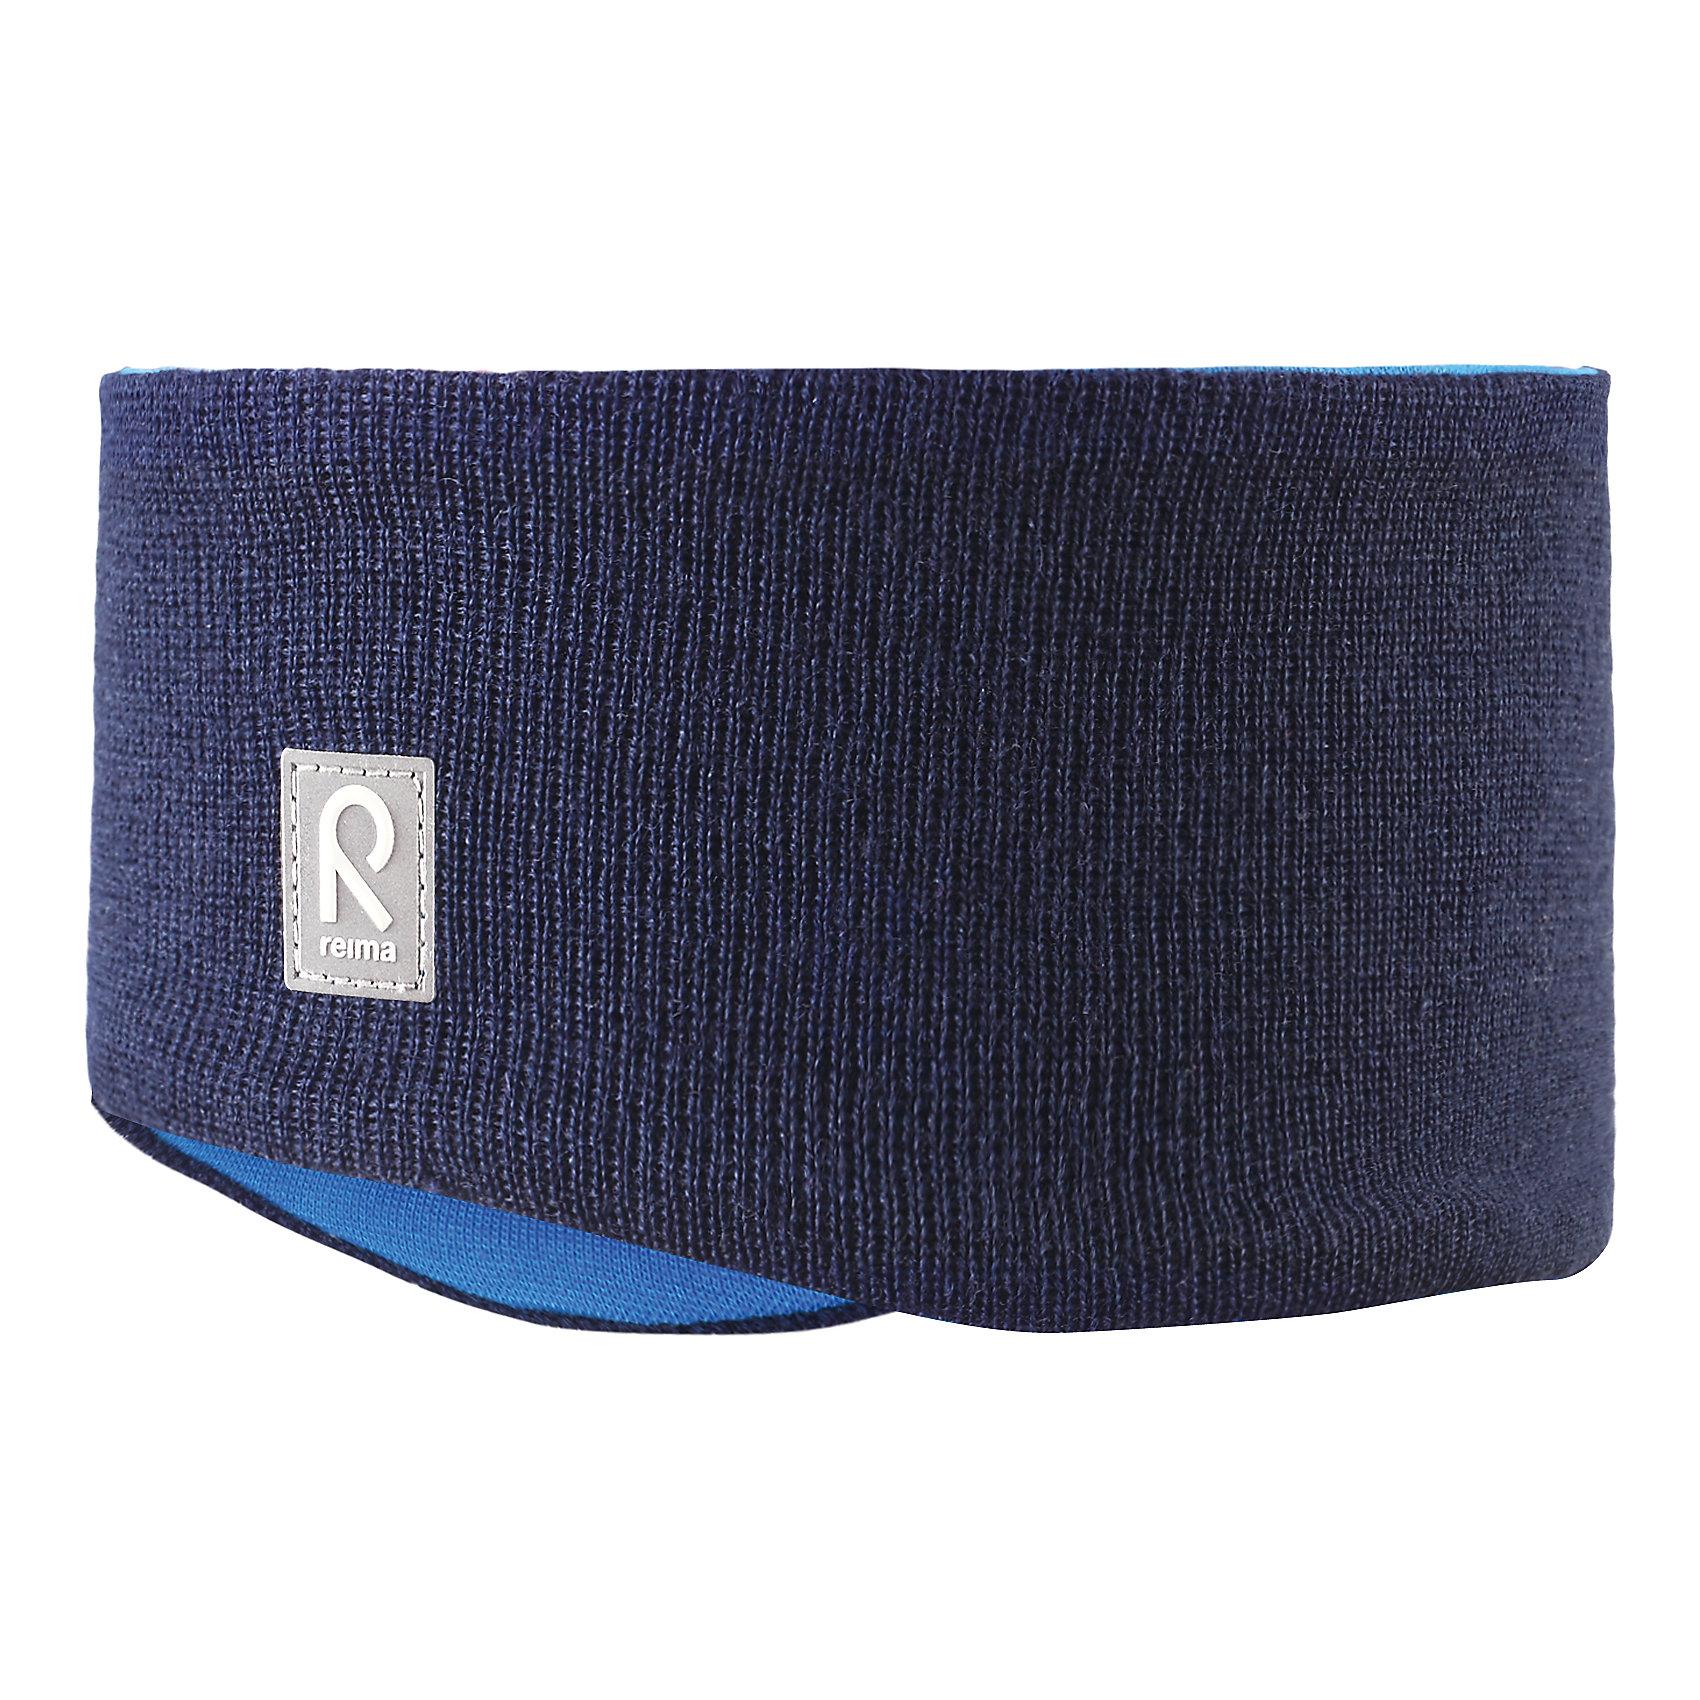 Reima Повязка на голову Tails для мальчика Reima многофункциональная повязка на голову